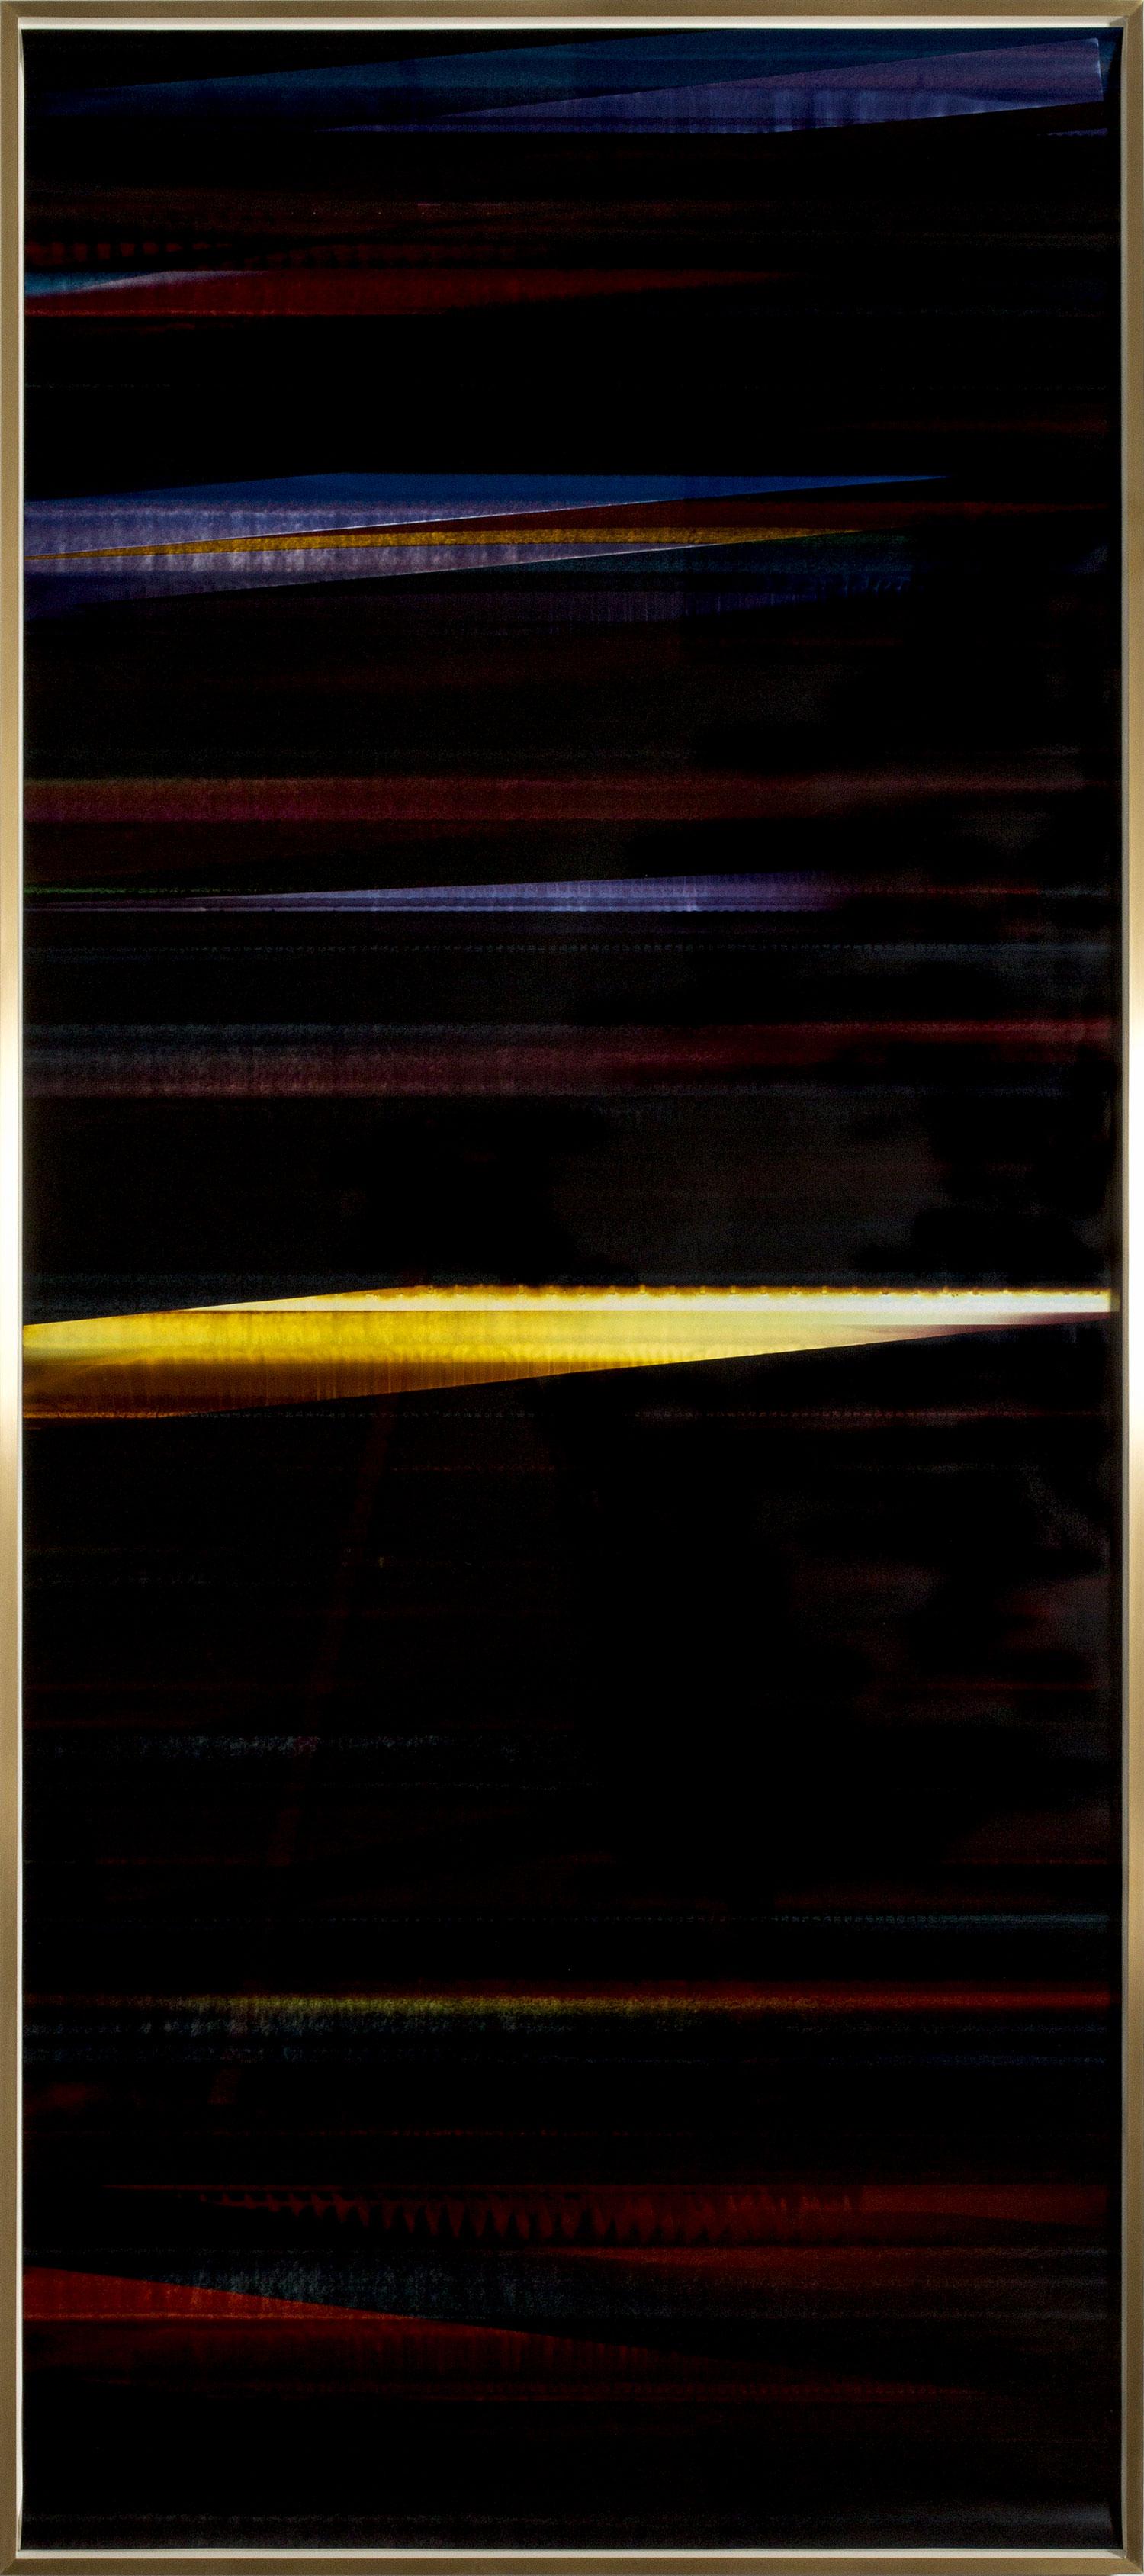 RA4 Contact Print / Processor Stall (YMC/Six Magnet: Los Angeles, California, September 12, 2014, Fujicolor Crystal Archive Super Type C, Em. No. 112-006, 100114), Kreonite KM IV 5225 RA4 Color Processor, Ser. No. 00092174    2016   Color photographic paper  120 1/4 x 51 1/2 inches   RA4 Contact Prints, 2014–